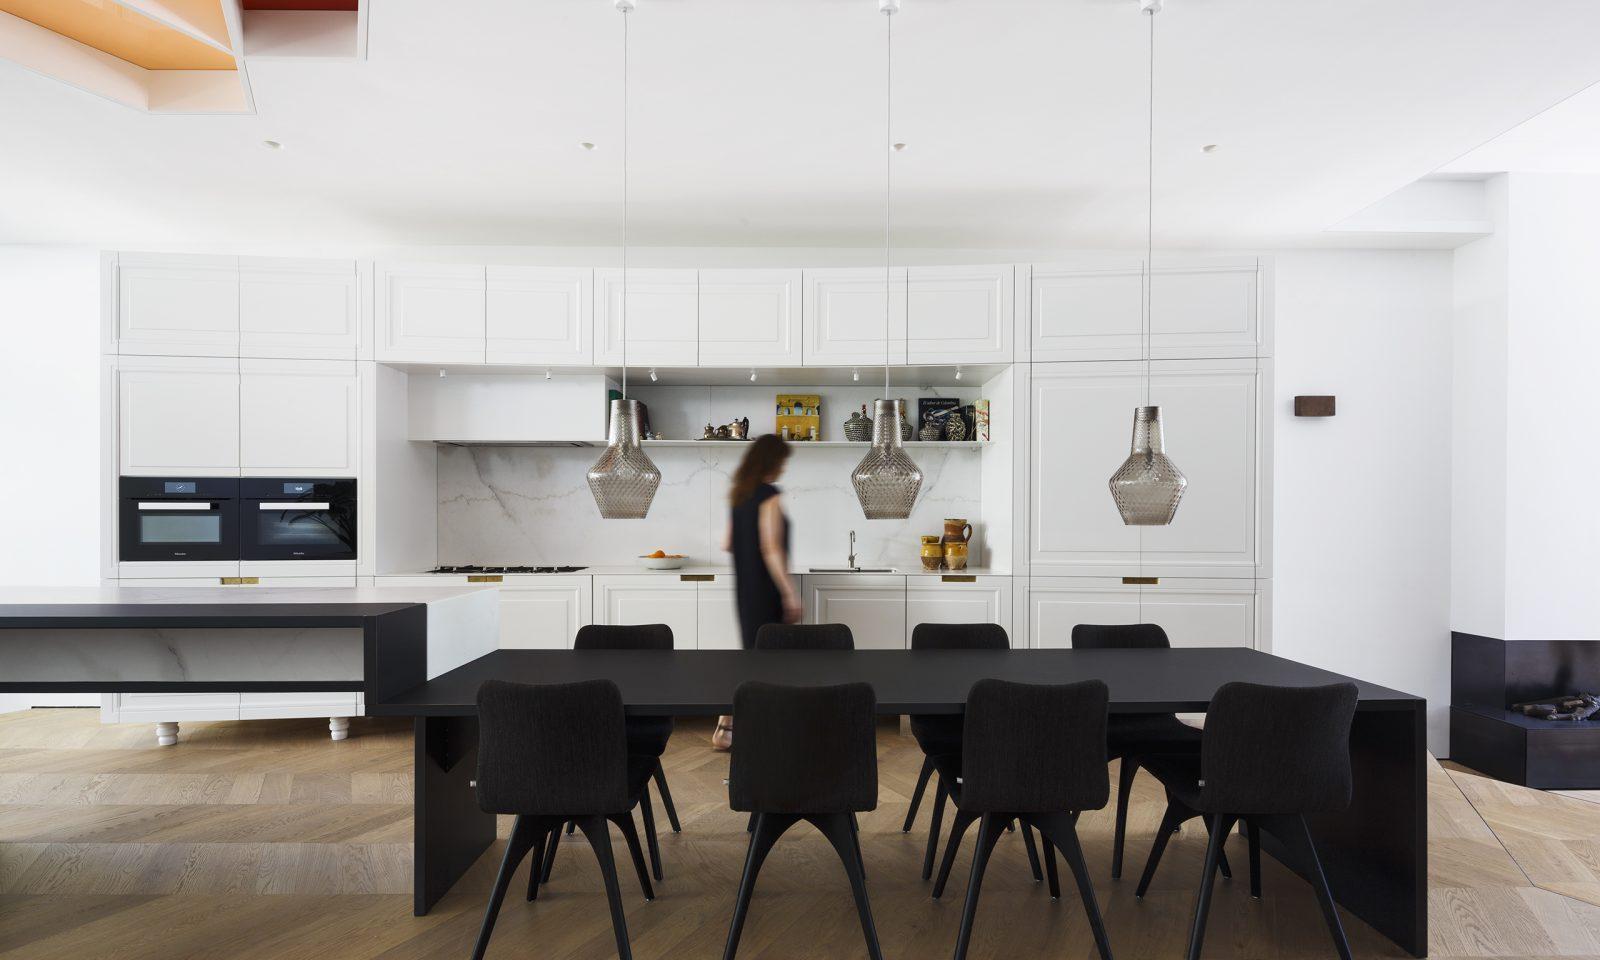 House Design Keuken : Ph house u2013 studioninedots